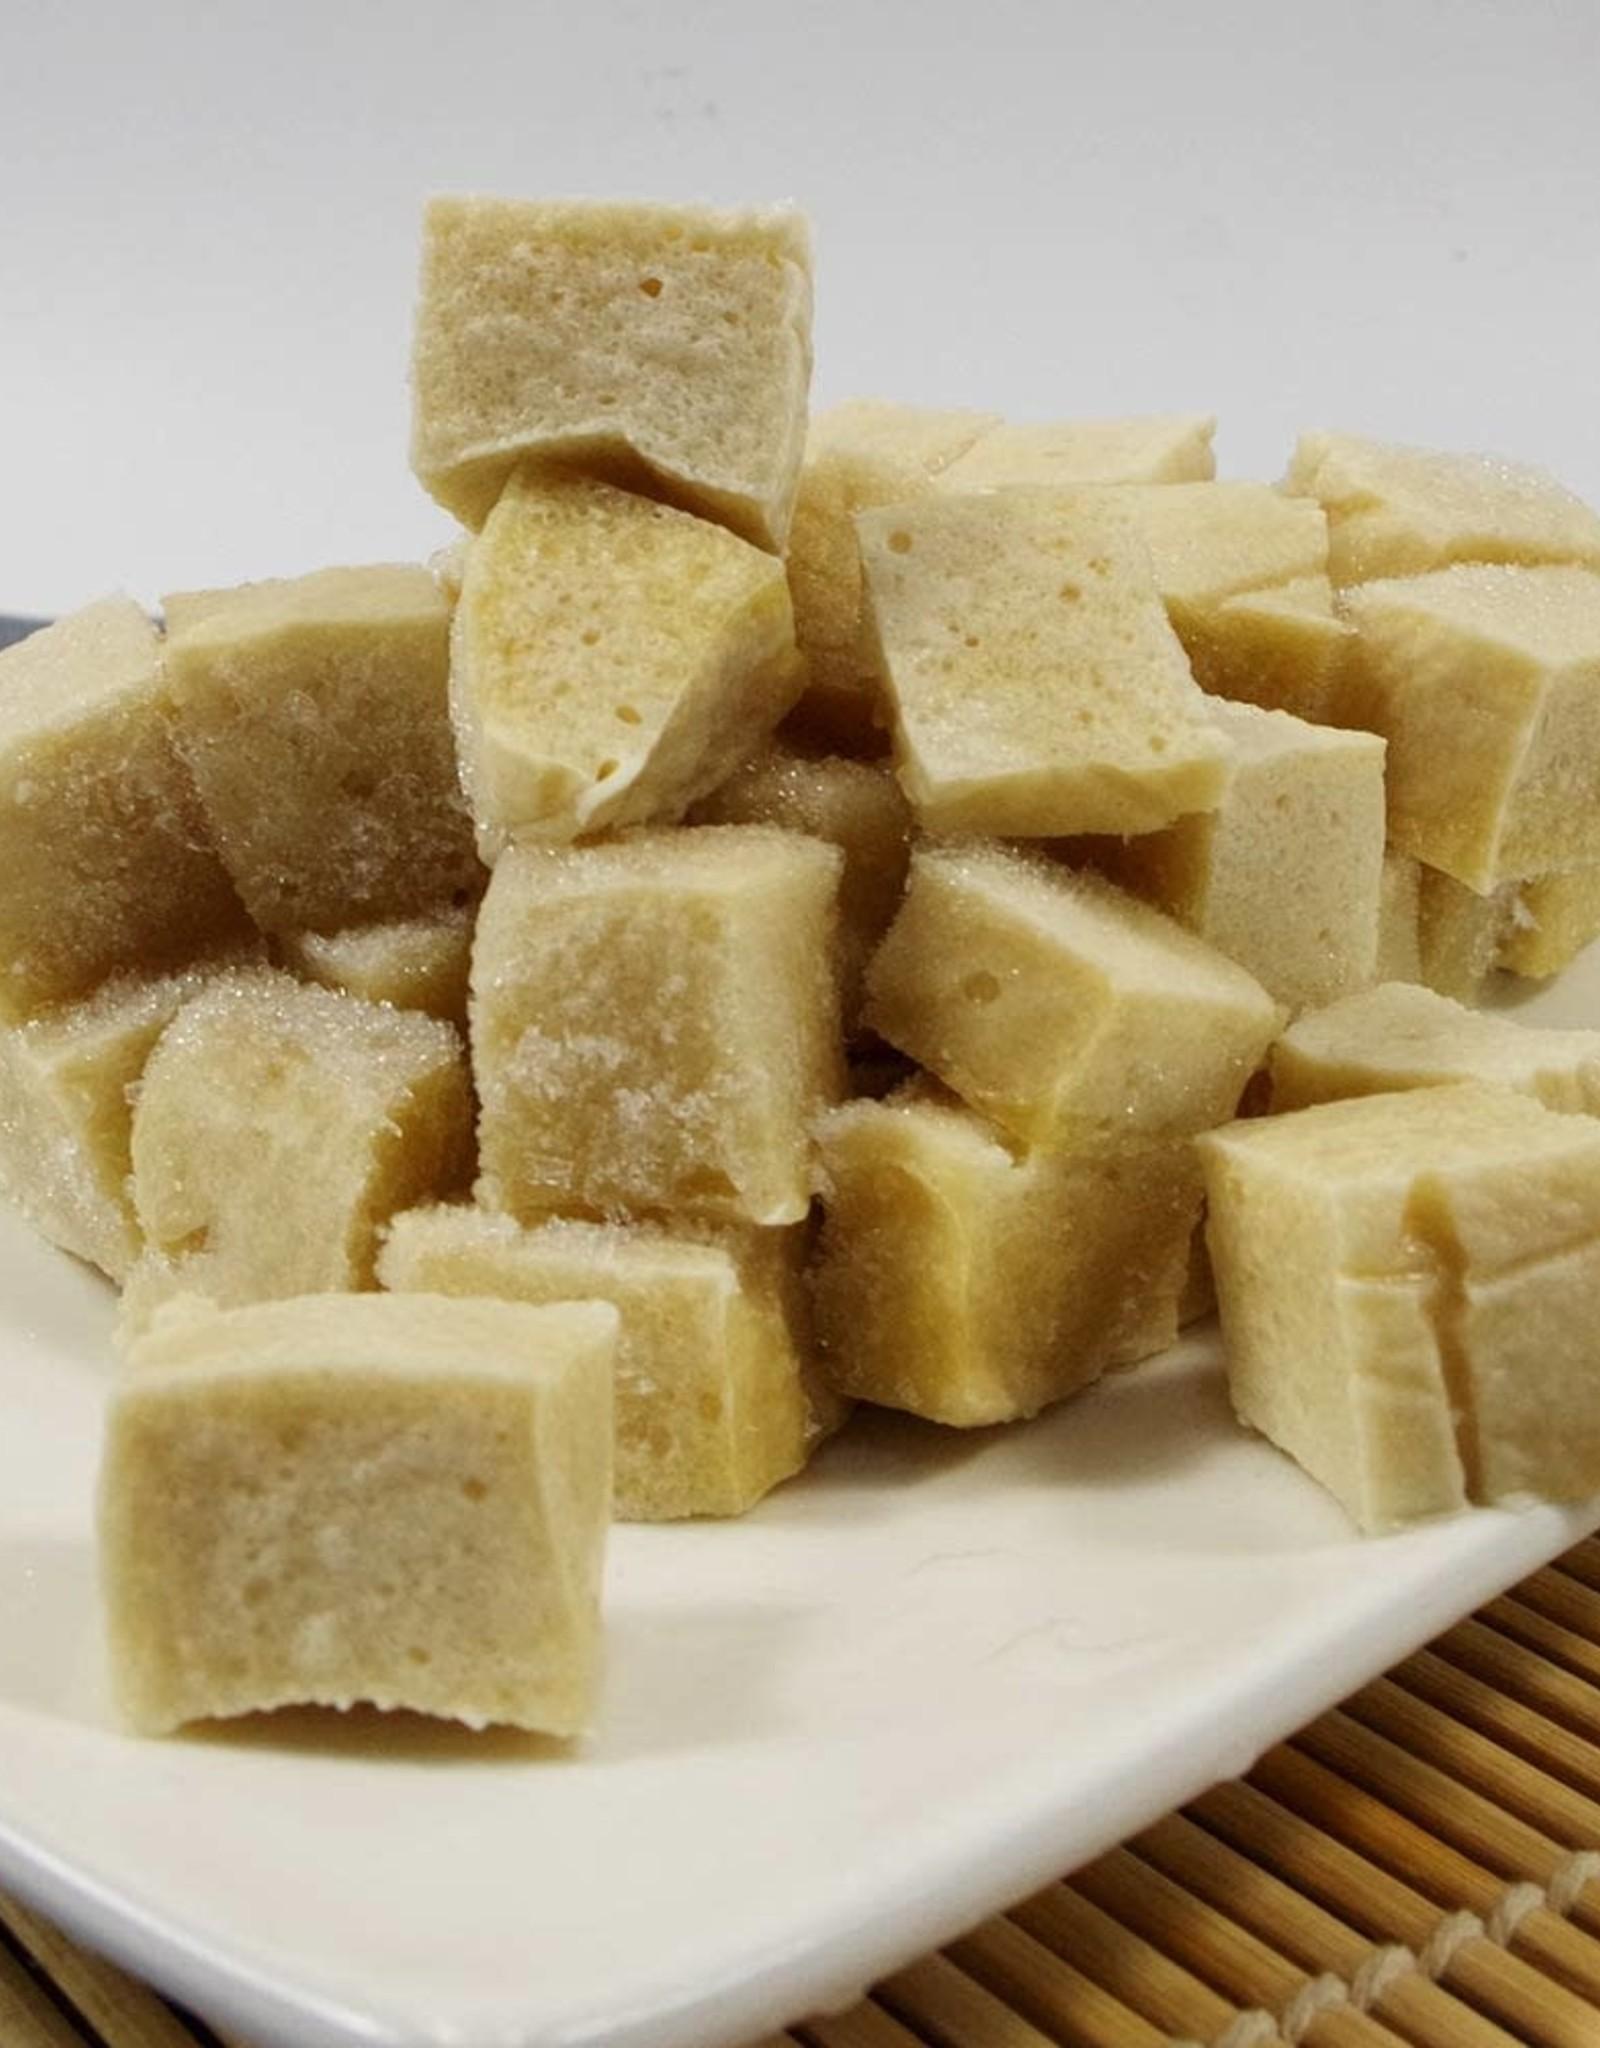 Da Cheng * 大政 (DC) Frozen Fried Tofu (L)*(大政) 百頁豆腐 (L)